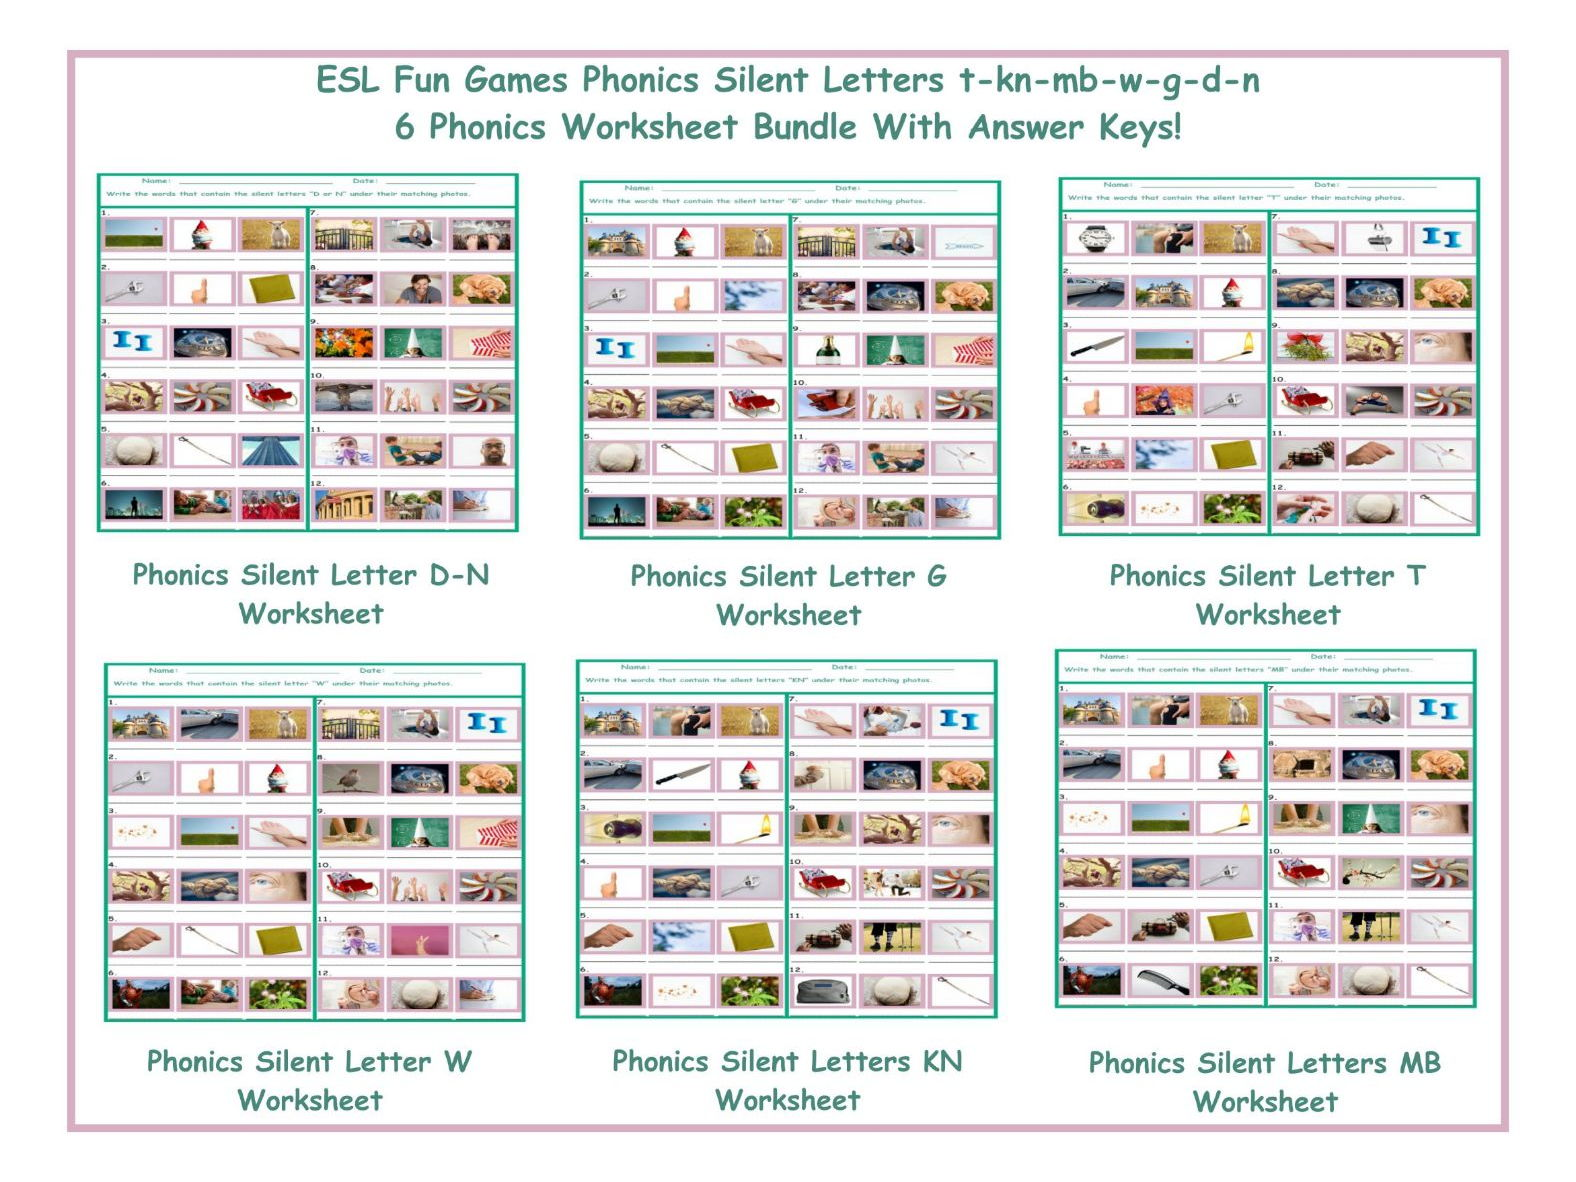 Phonics Silent Letters T Kn Mb W G D N Six Game Bundle